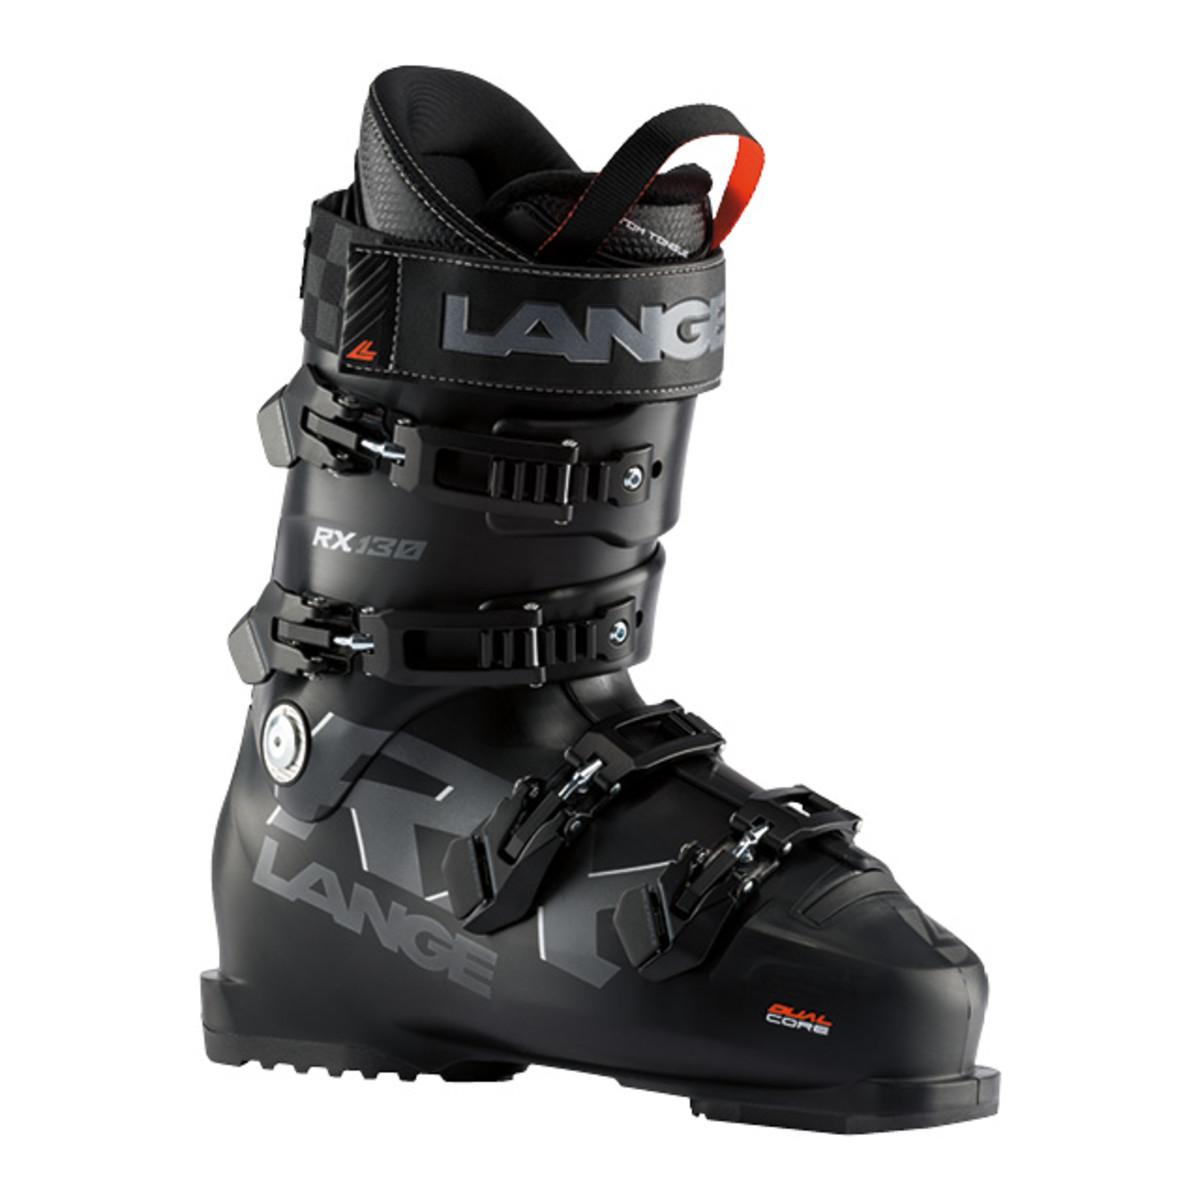 Salomon SPro 130 Bootfitter Ski Boot  